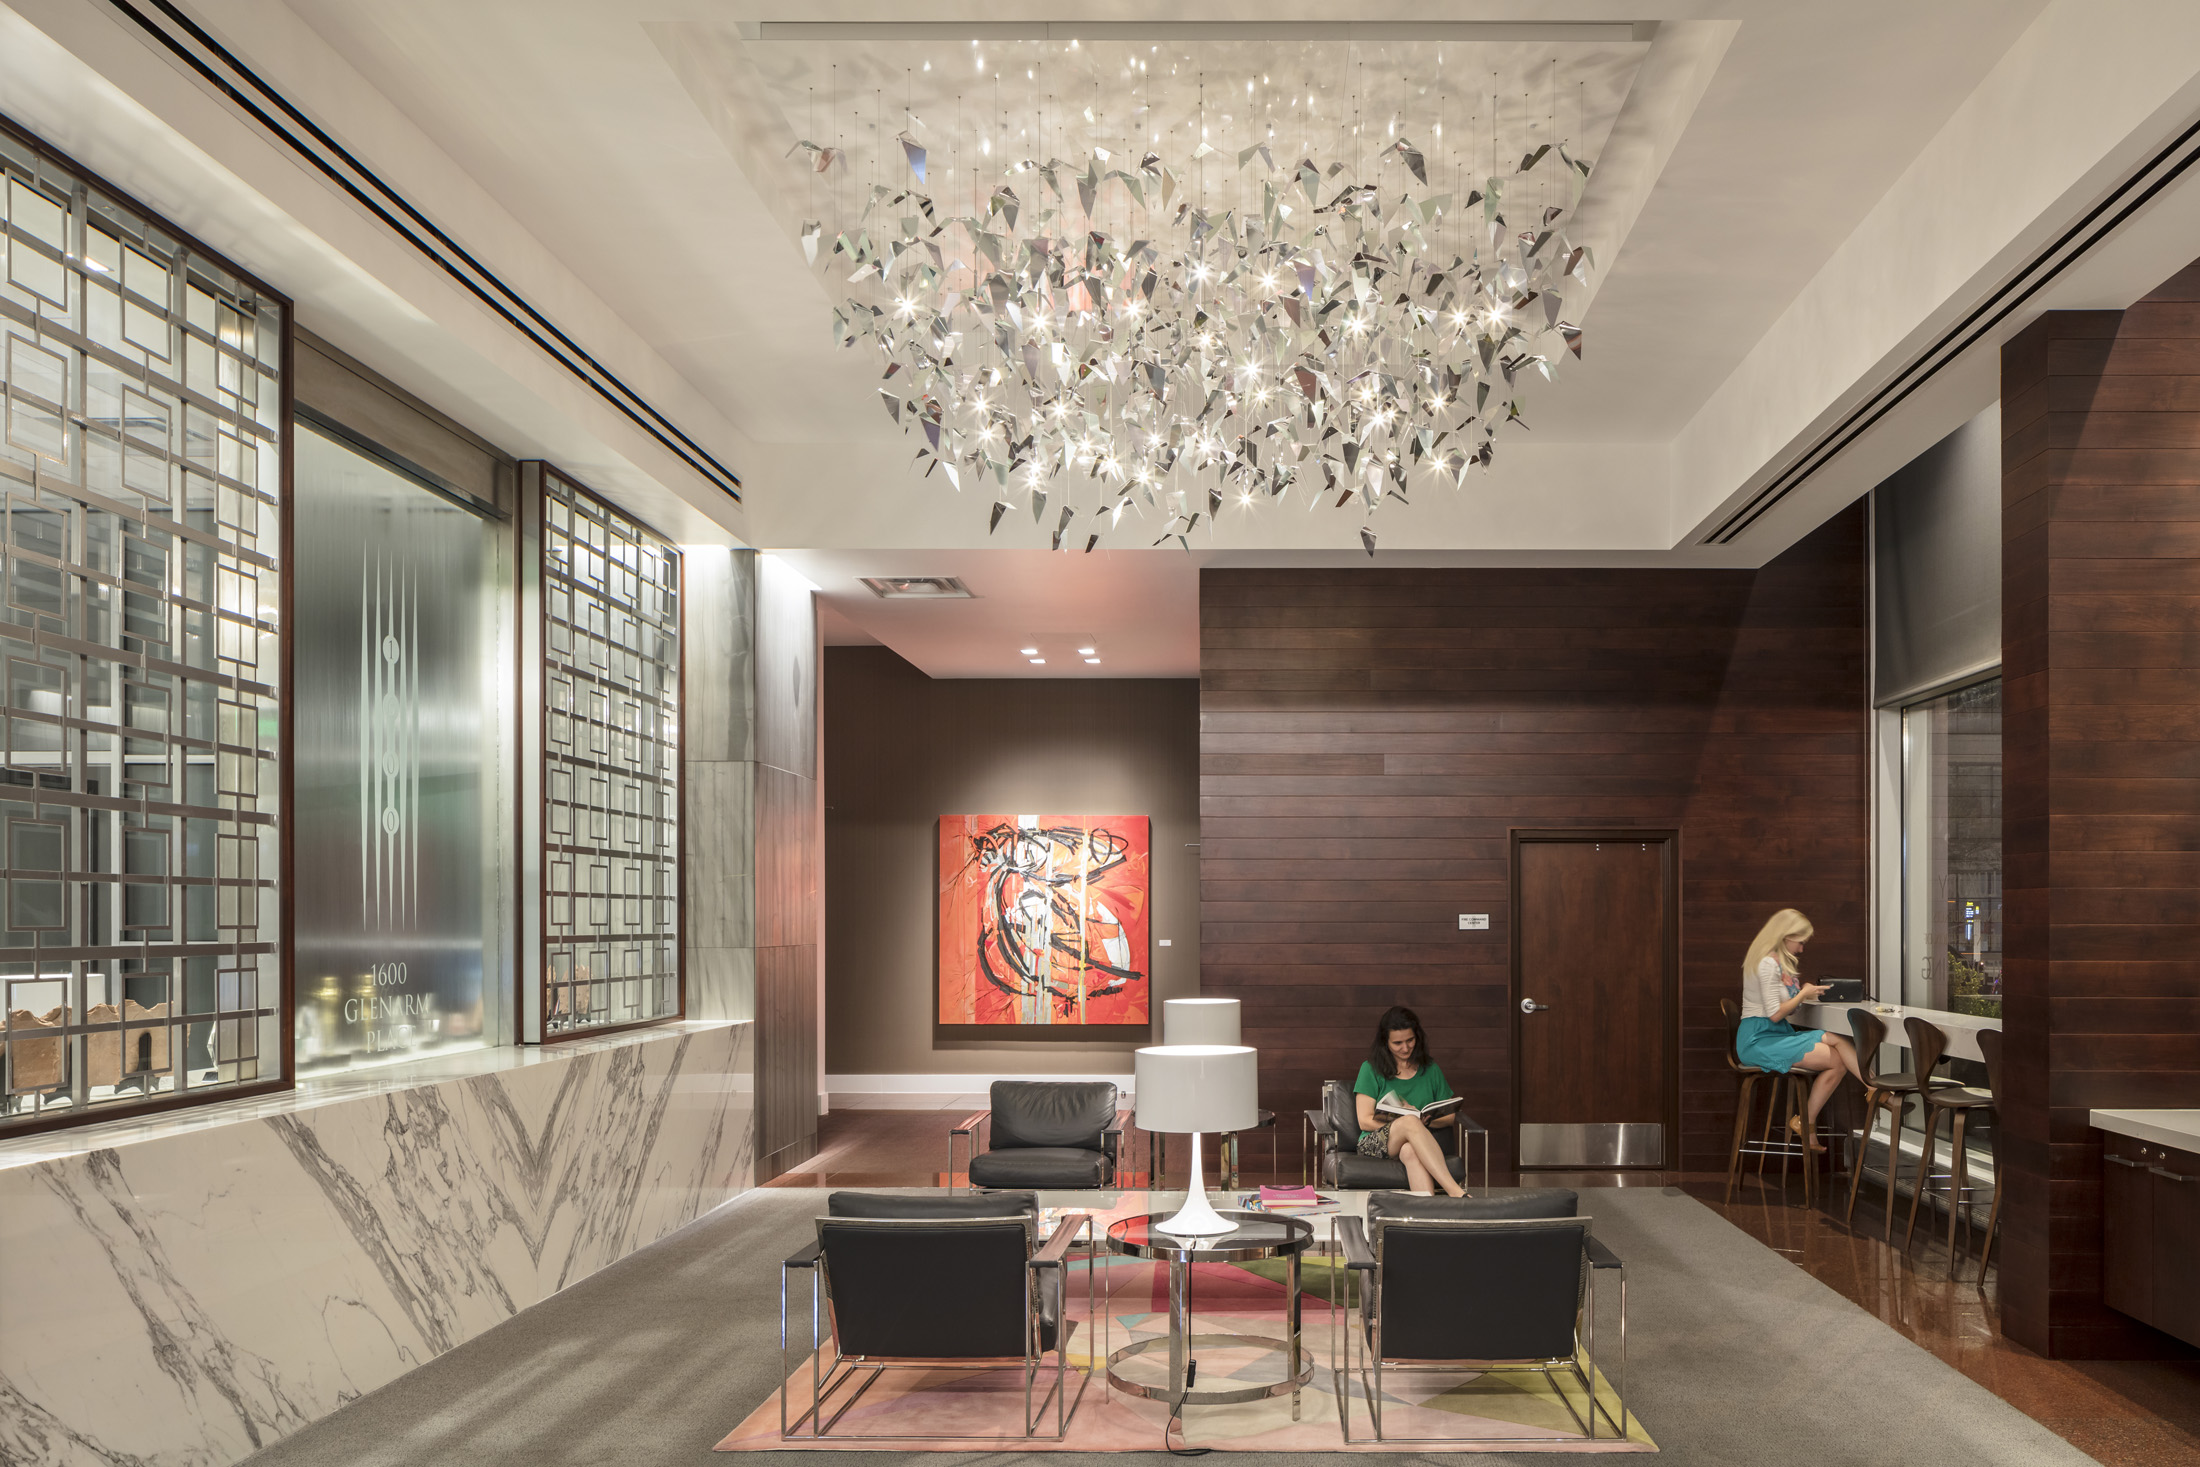 Award of Merit - 1600 Glenarm Lobby RenovationLisa Bartlett - Davis Partnership Architects